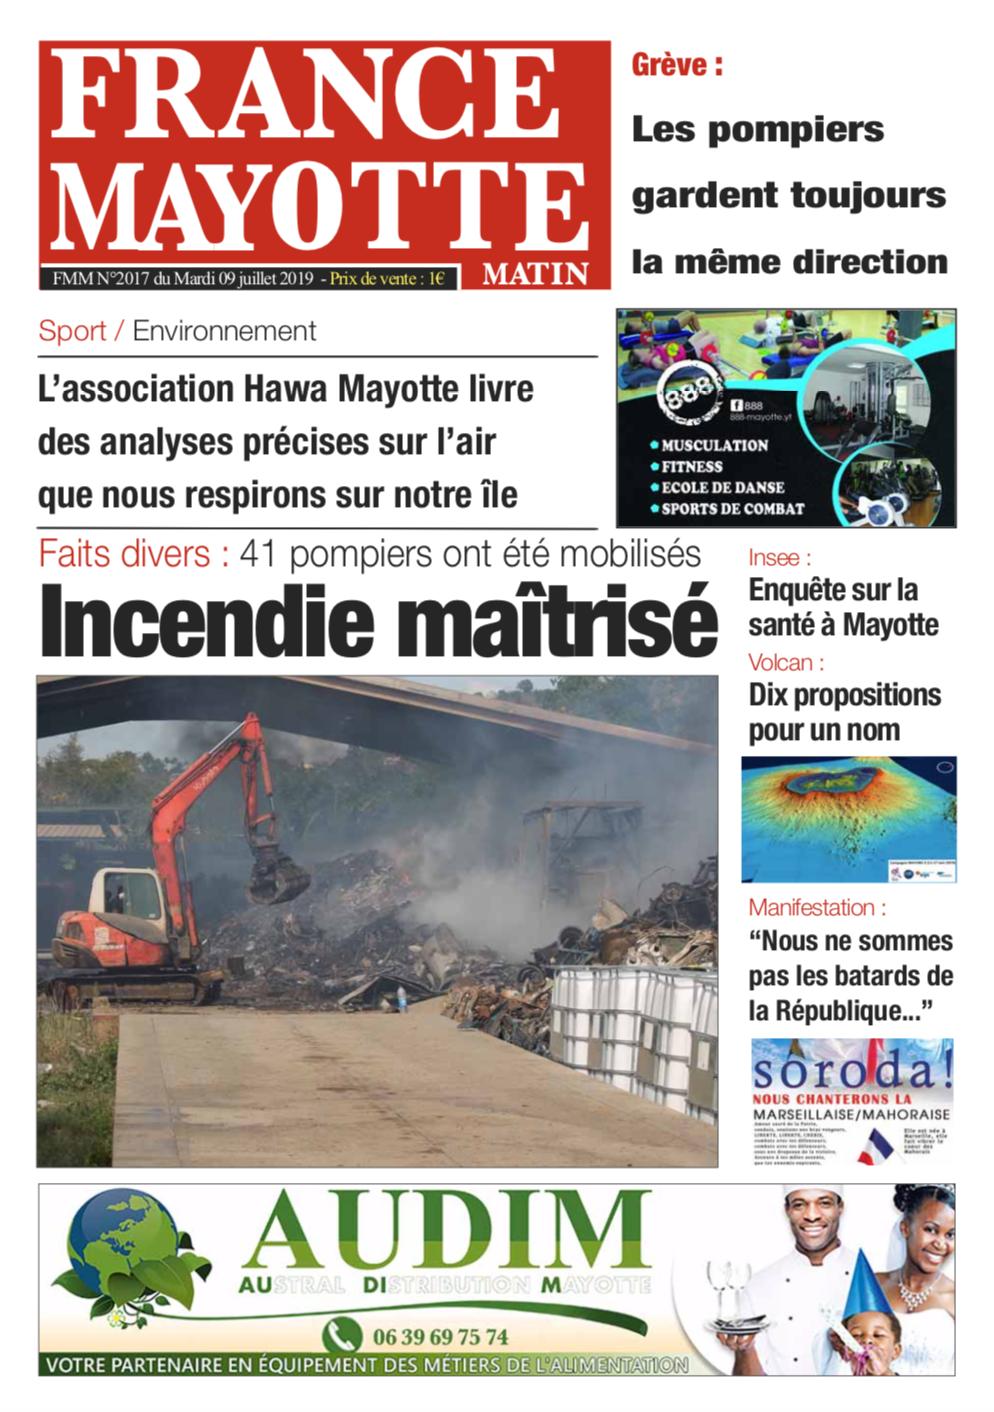 France Mayotte Mardi 9 juillet 2019